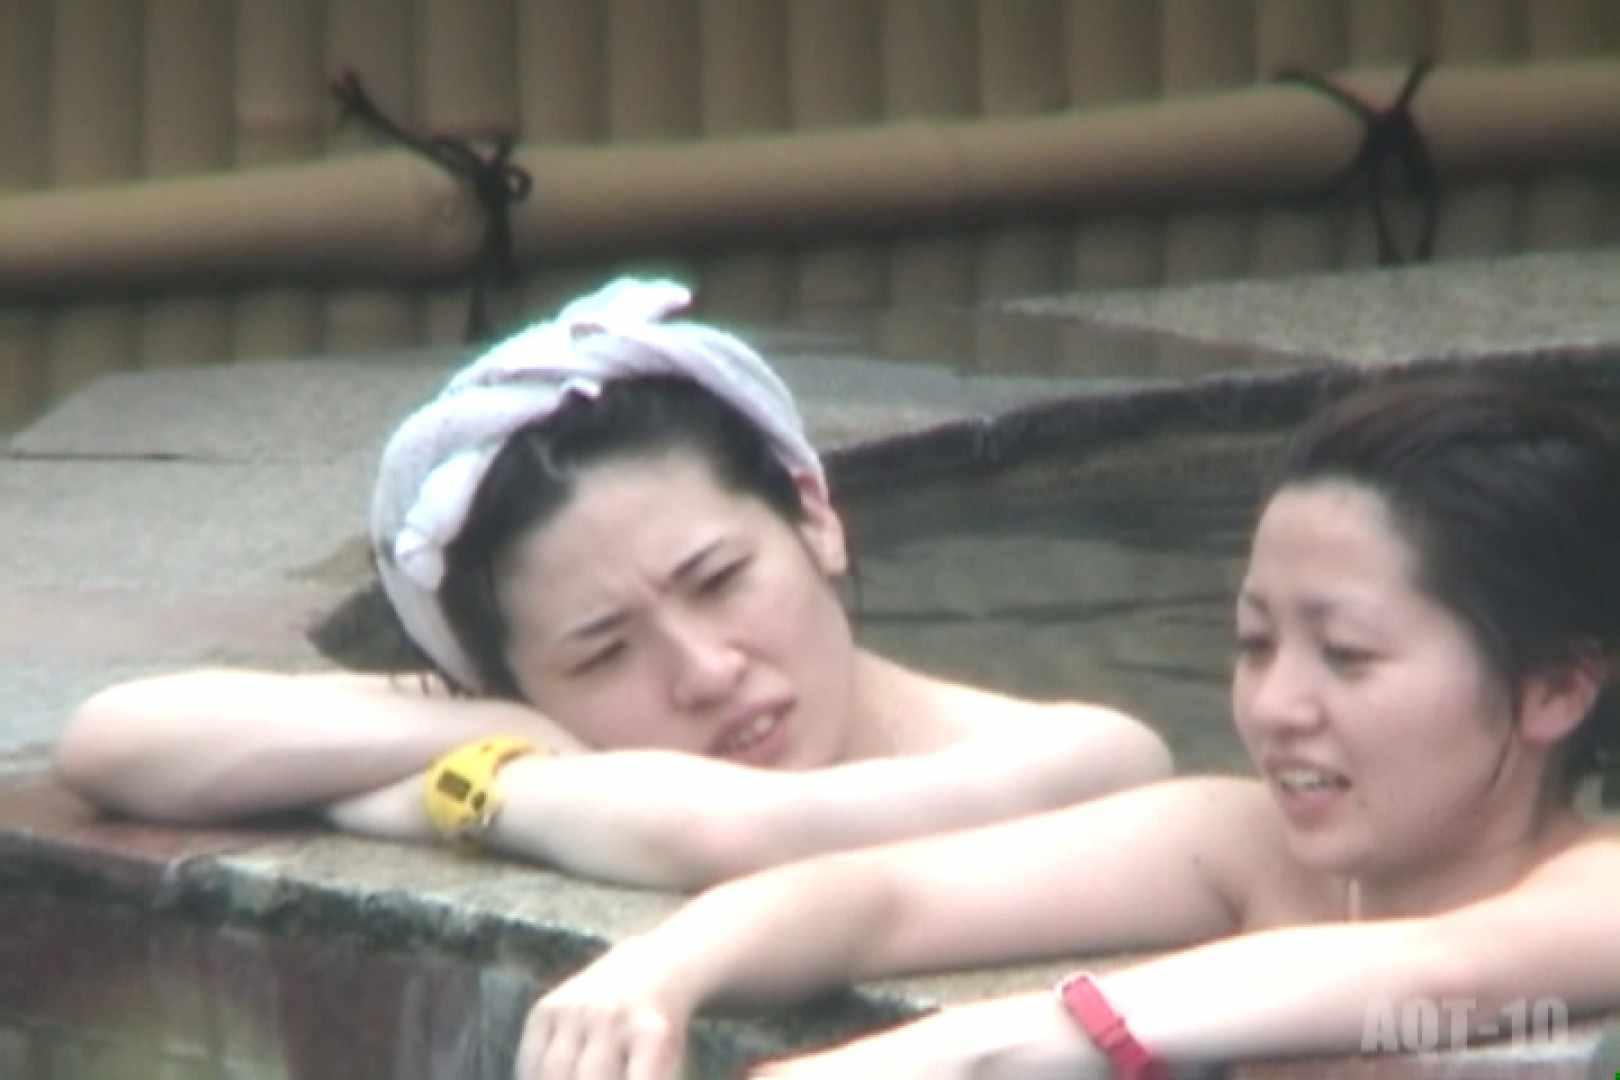 Aquaな露天風呂Vol.793 盗撮シリーズ   露天風呂編  93PIX 53